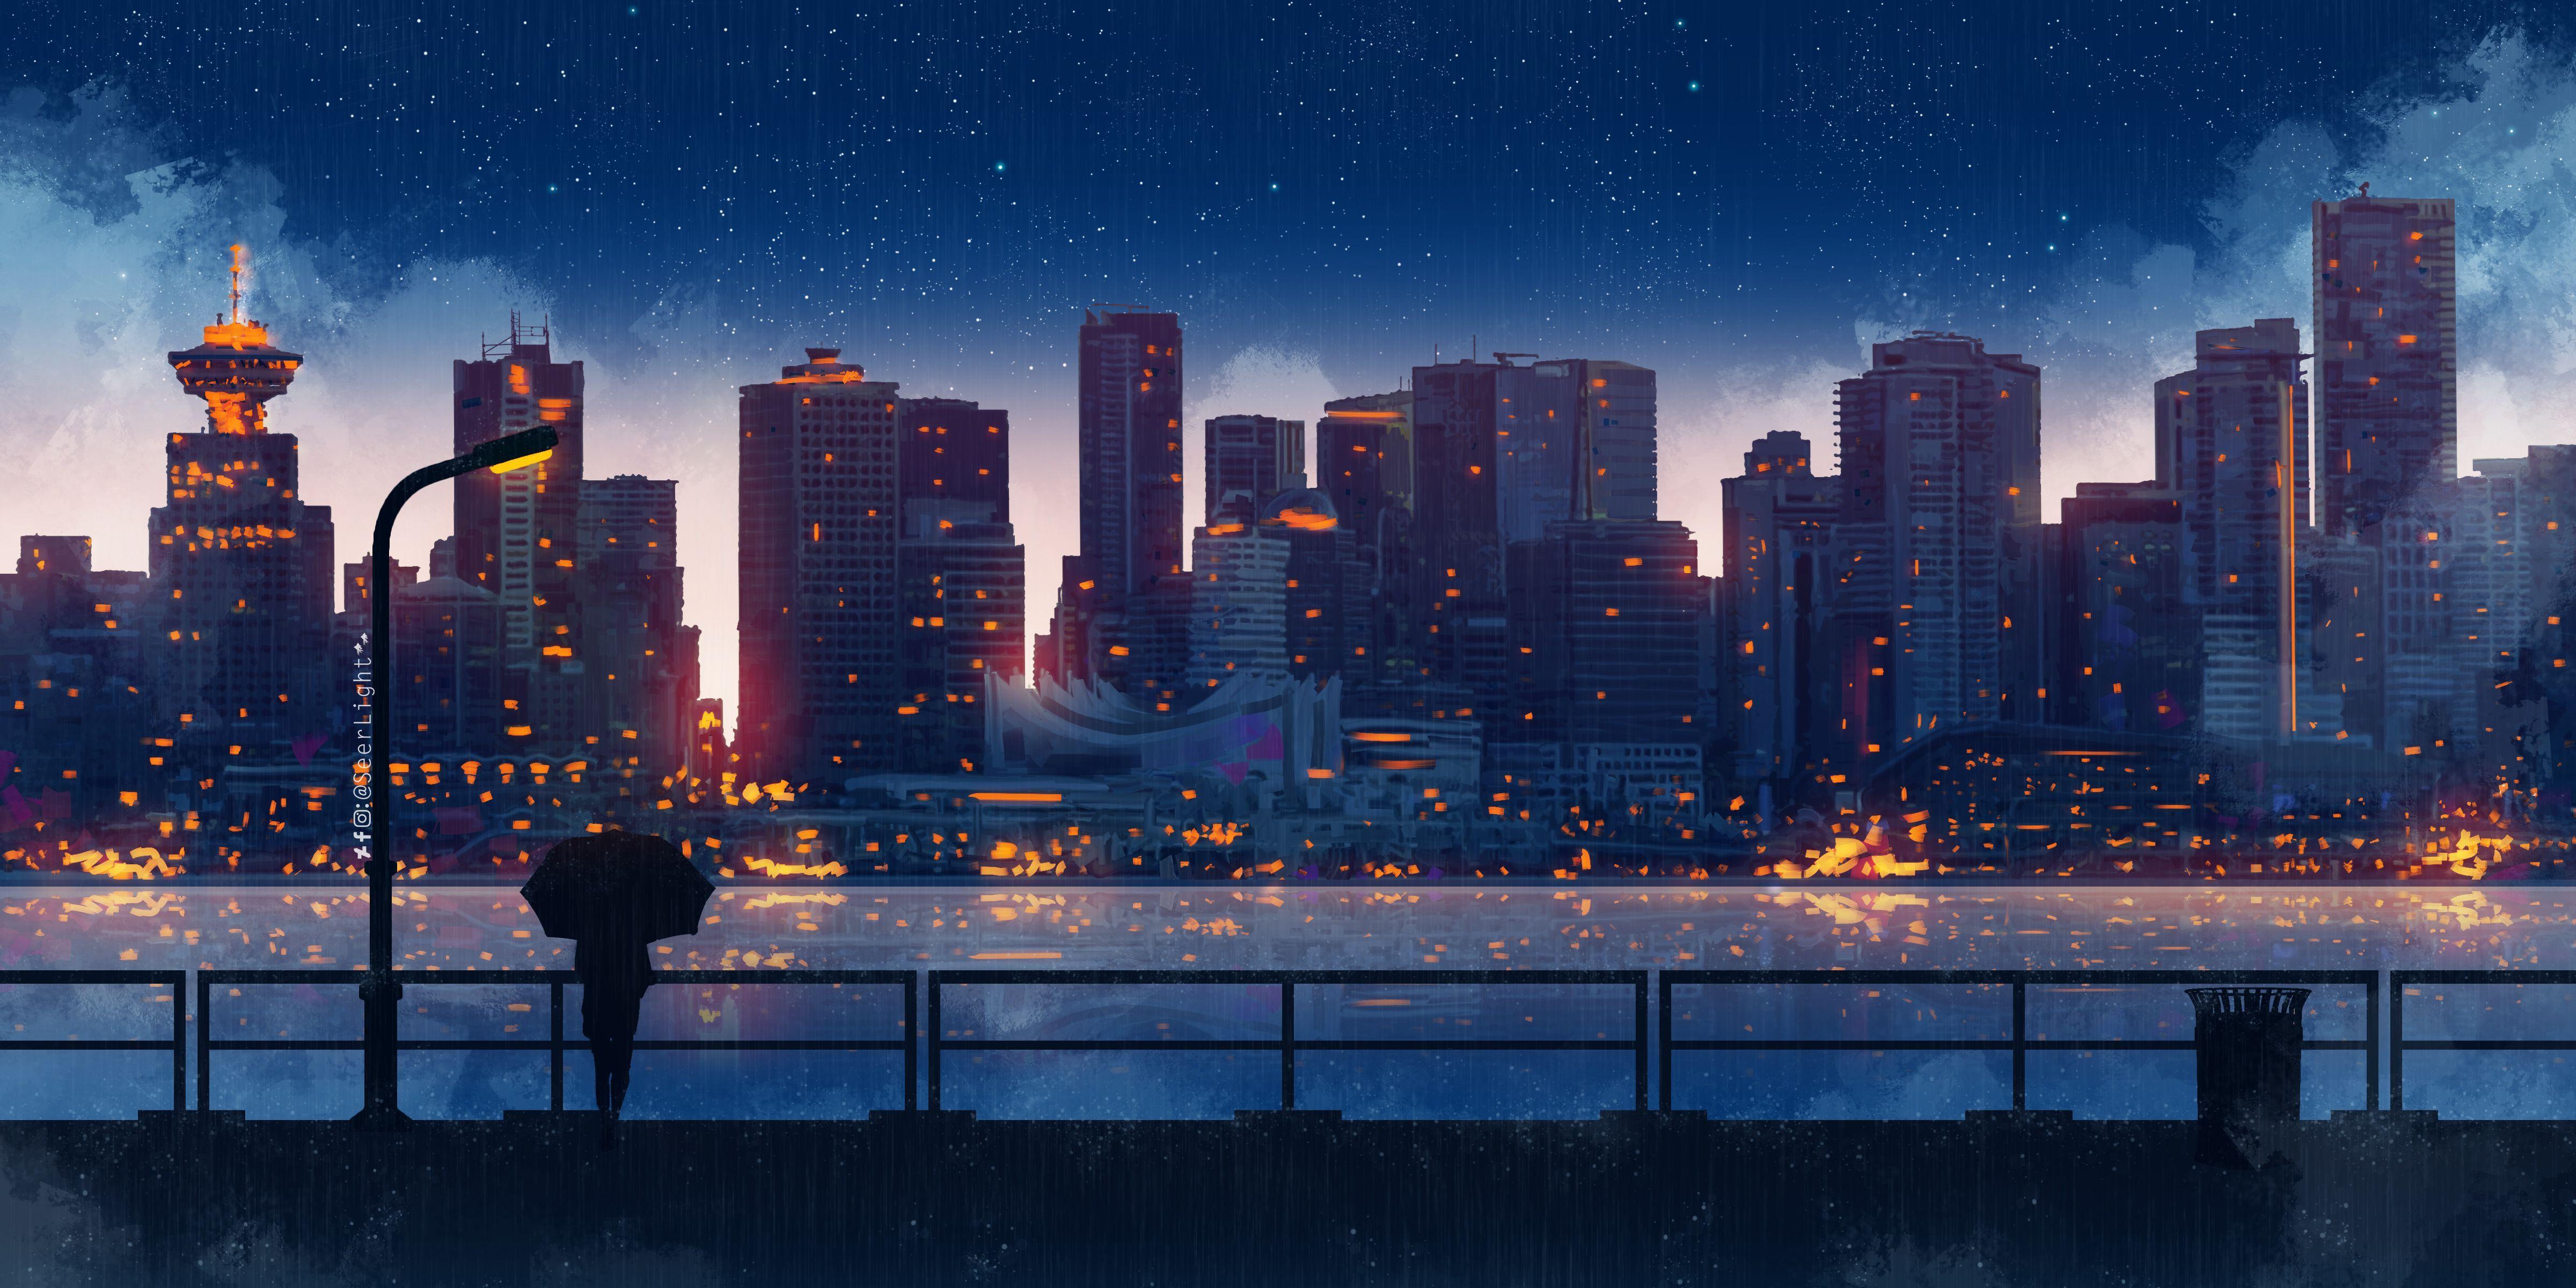 Aesthetic Rain Anime Desktop Wallpapers Wallpaper Cave